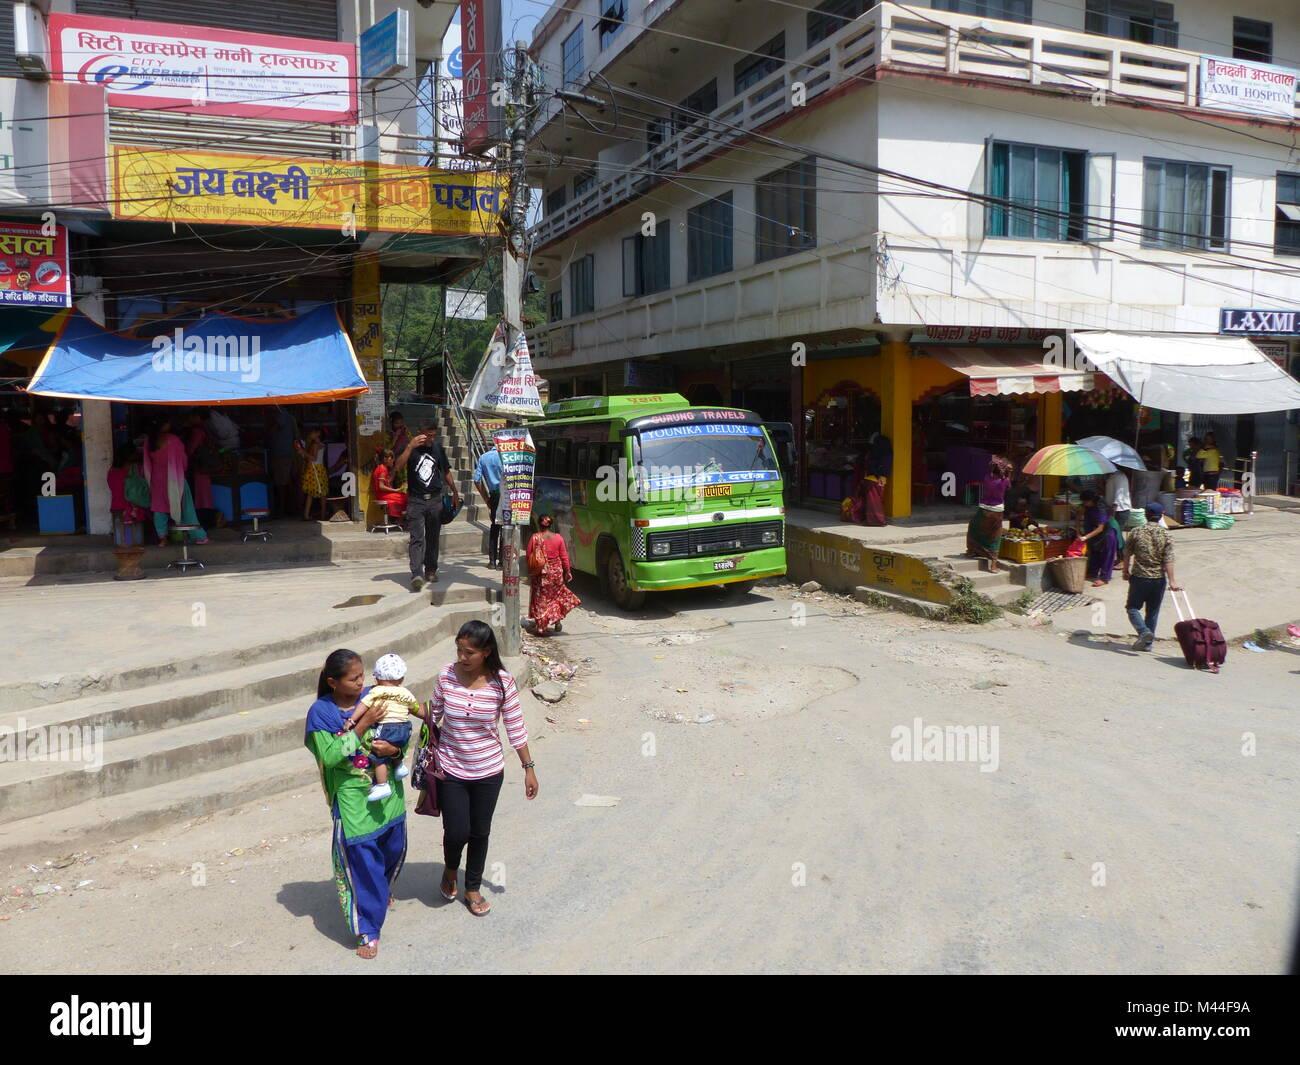 Kathmandu, Nepal, september 5, 2015: People on the street, just an ordinary day in Kathmandu - Stock Image